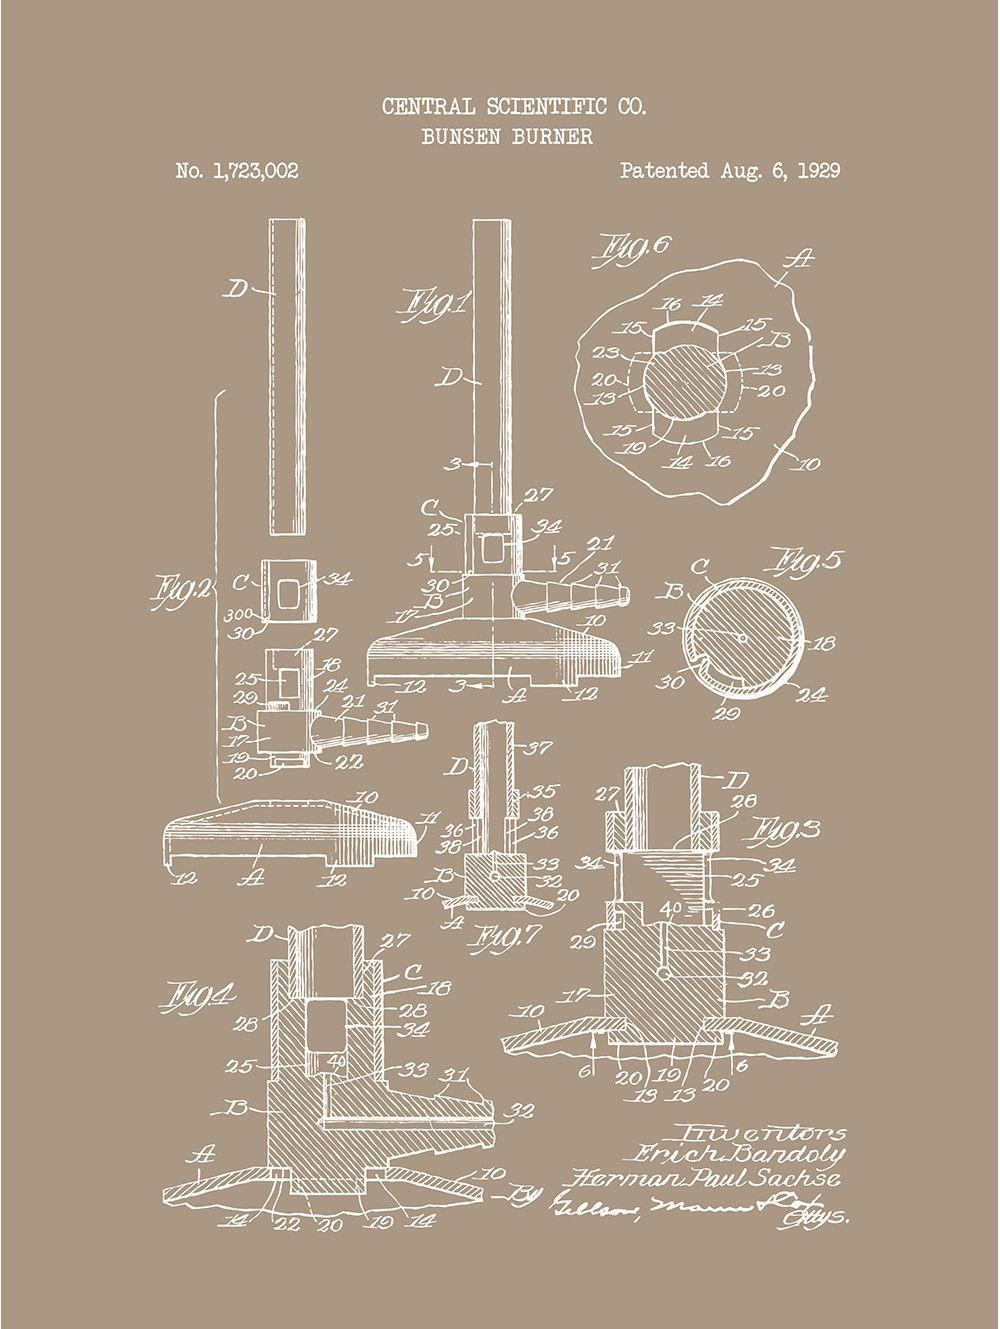 bunsen burner central scientific co 1929 products pinterest